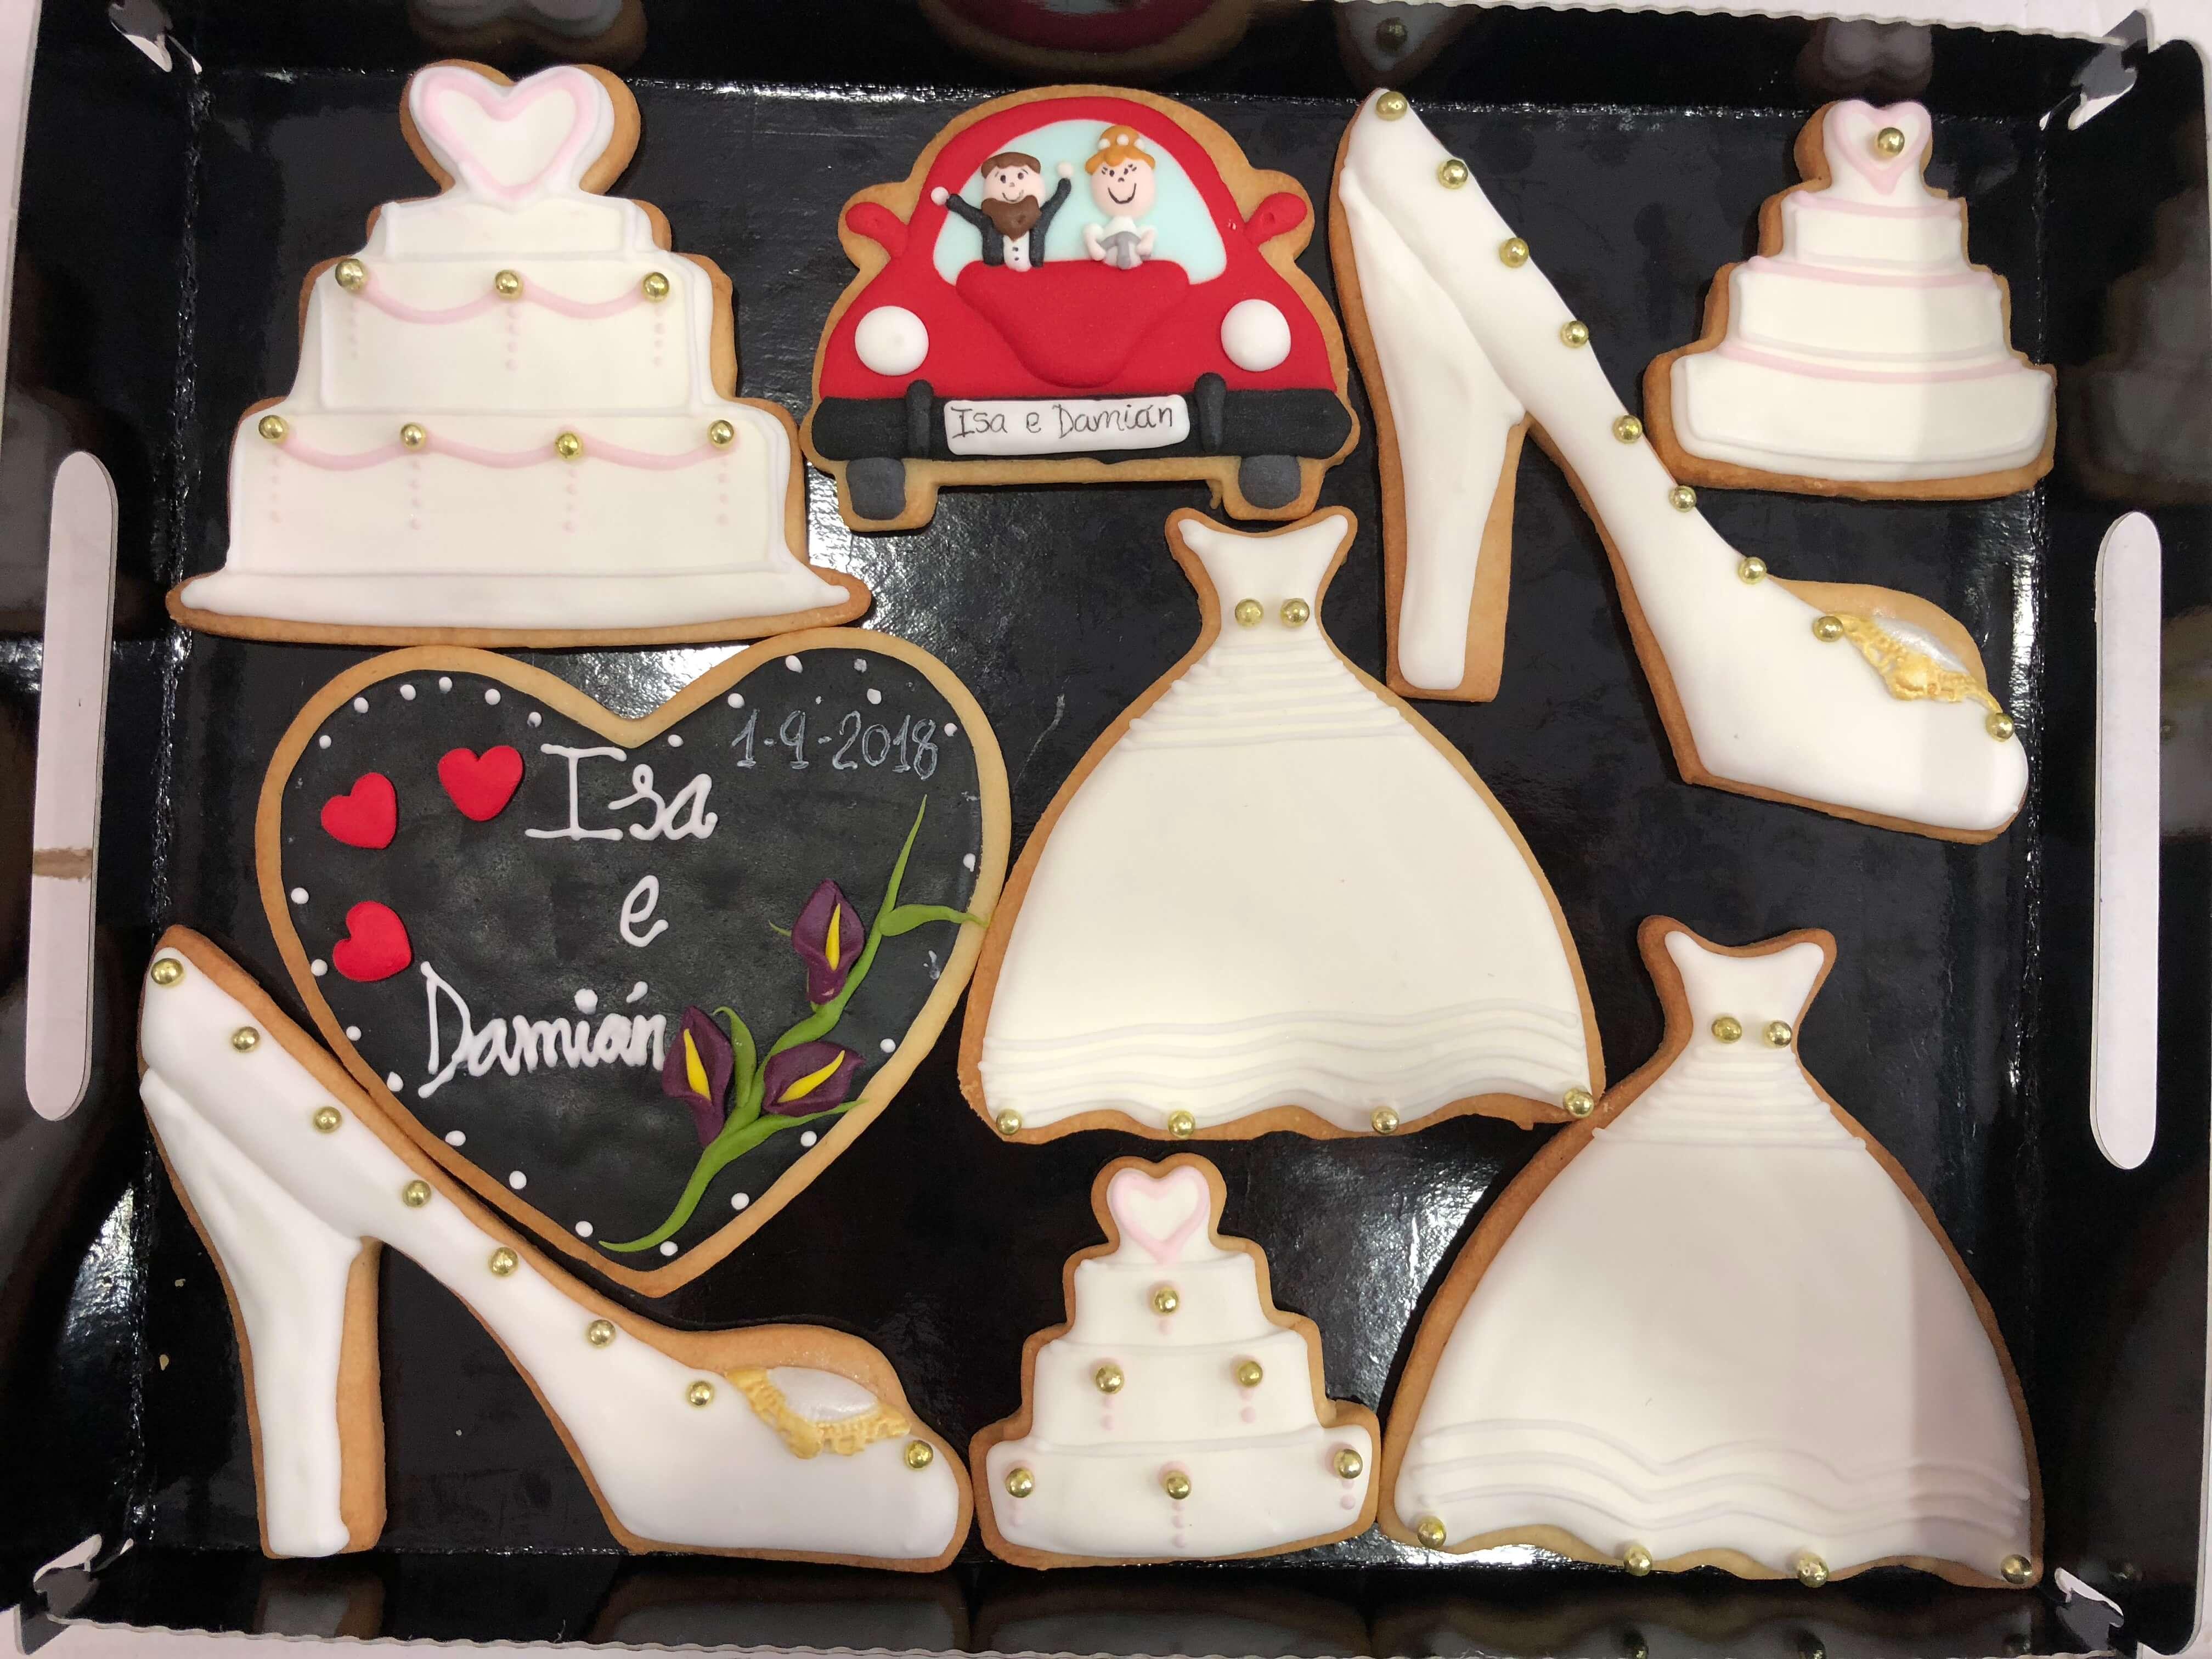 Galletas decoradas novios pareja familia coruña galletas novios